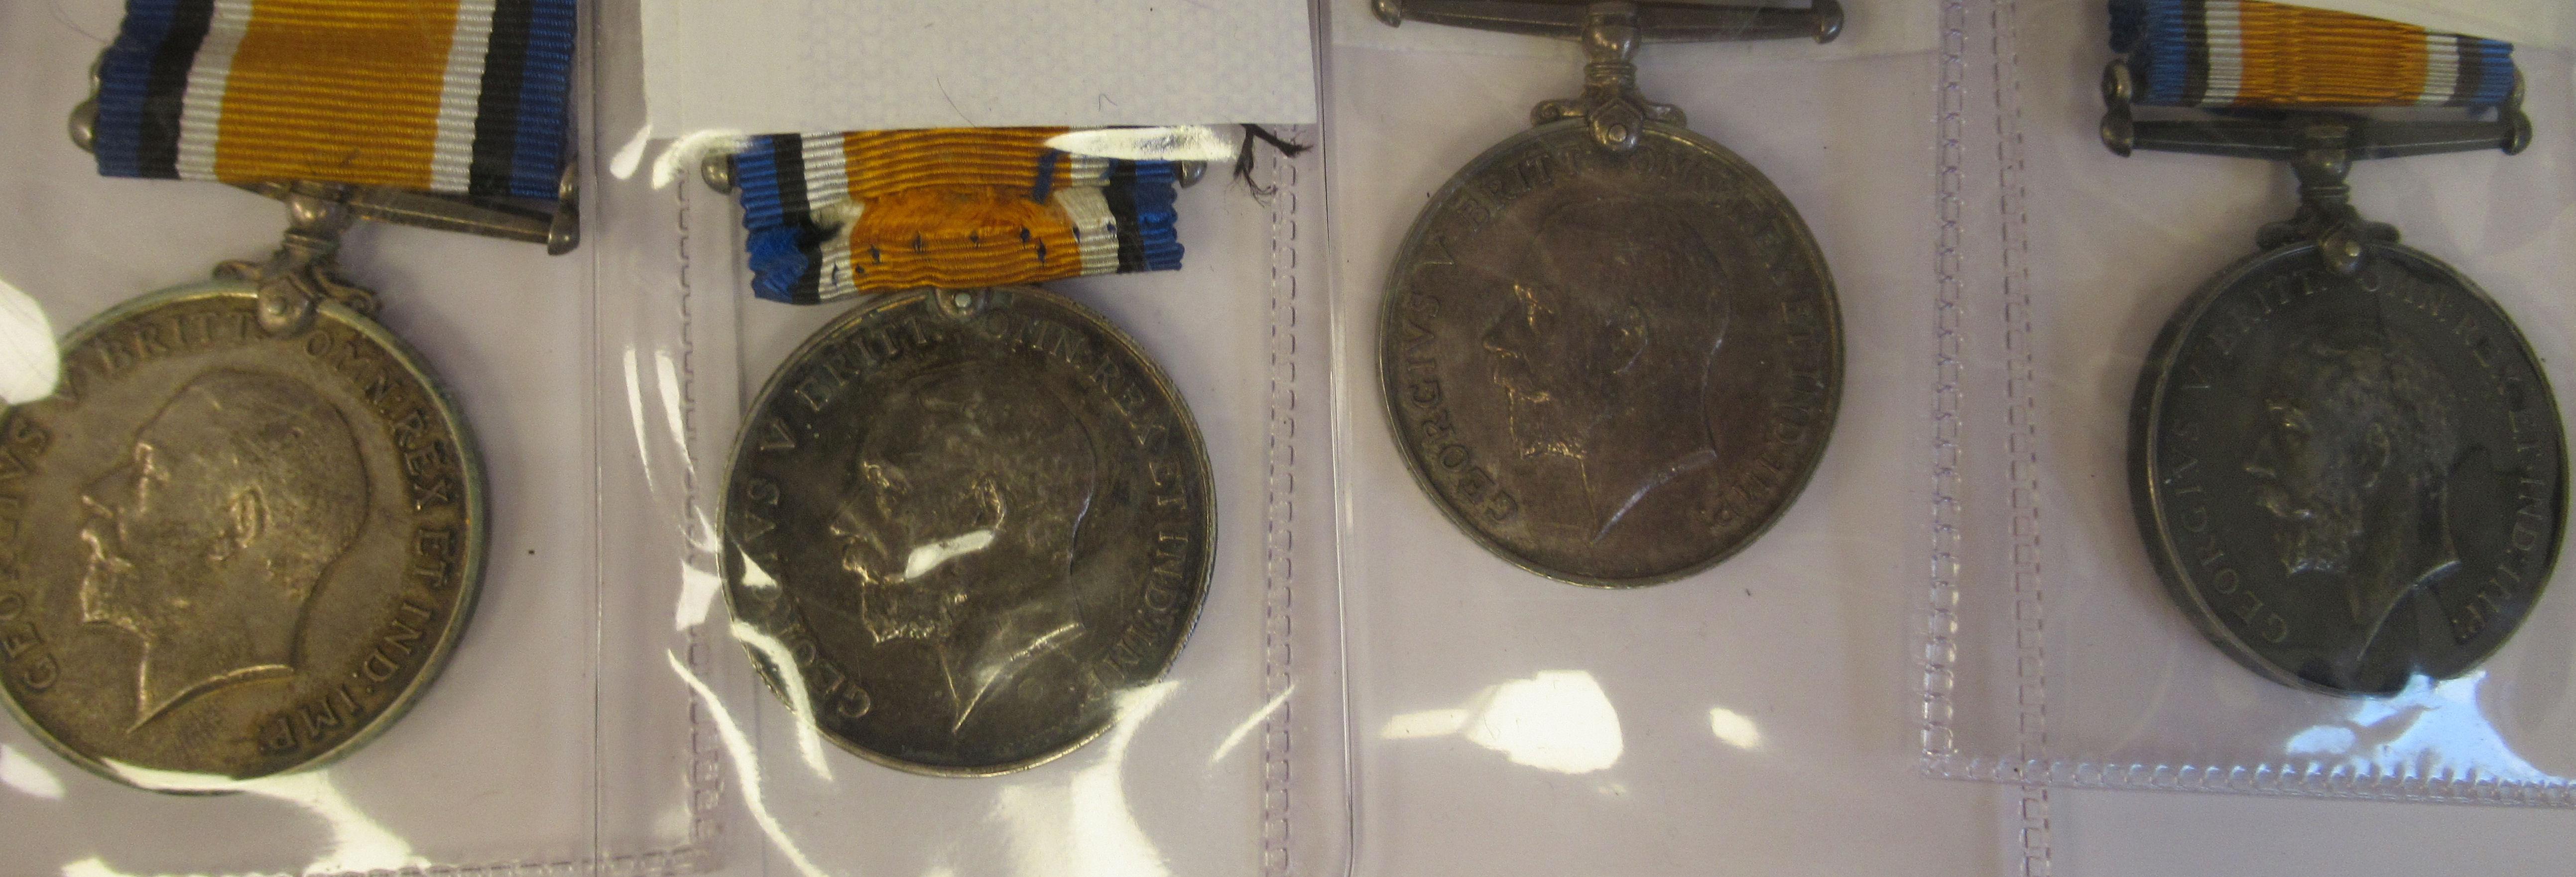 Twenty-four Great War 1914-1918 British service medals on ribbons, viz. 46481, Gnr. E. Williamson - Image 16 of 16